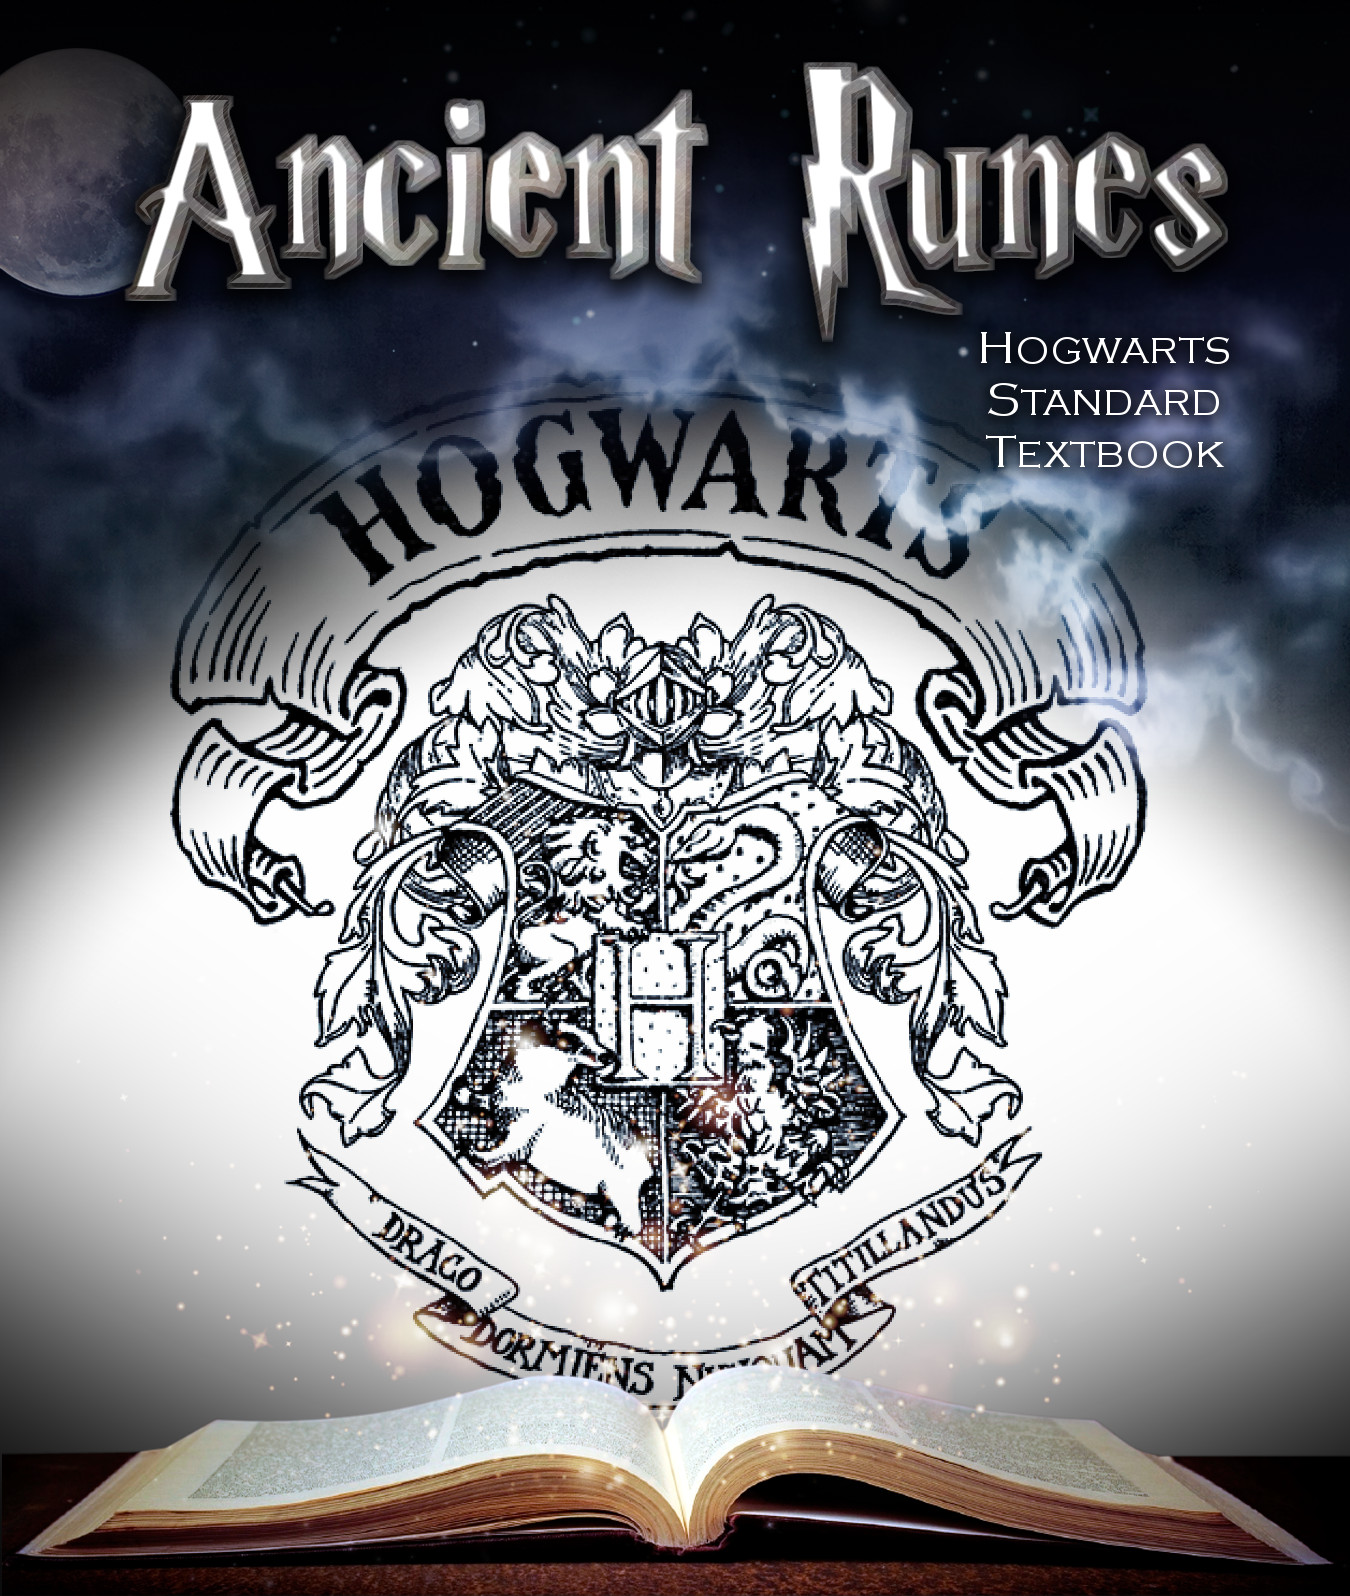 Ancient Runes I  Hogwarts Standard Textbook  Hogwarts